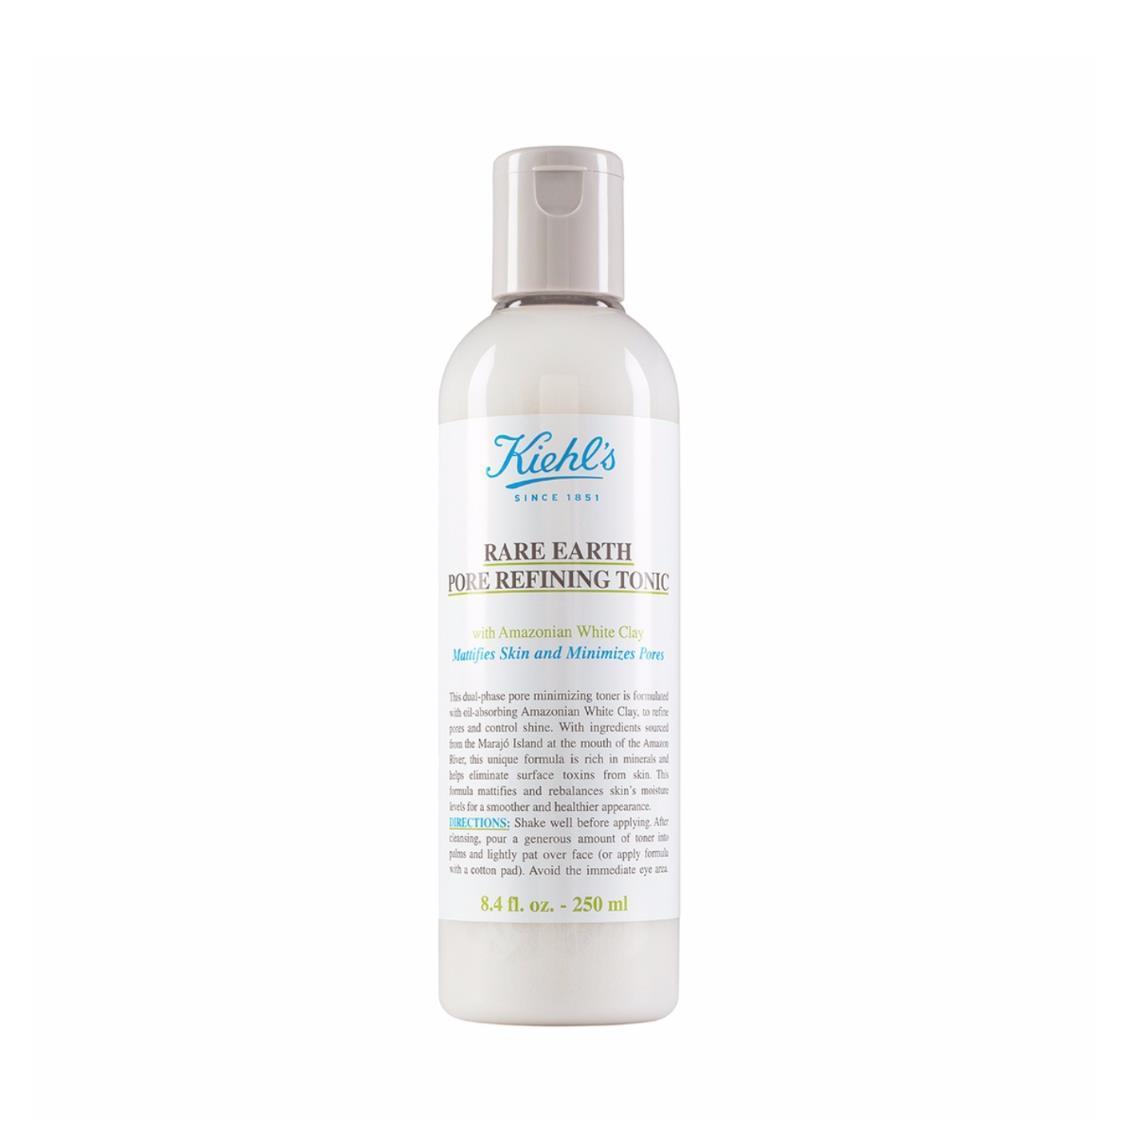 Kiehls Since 1851 Rare Earth Pore Refining Tonic 250ml